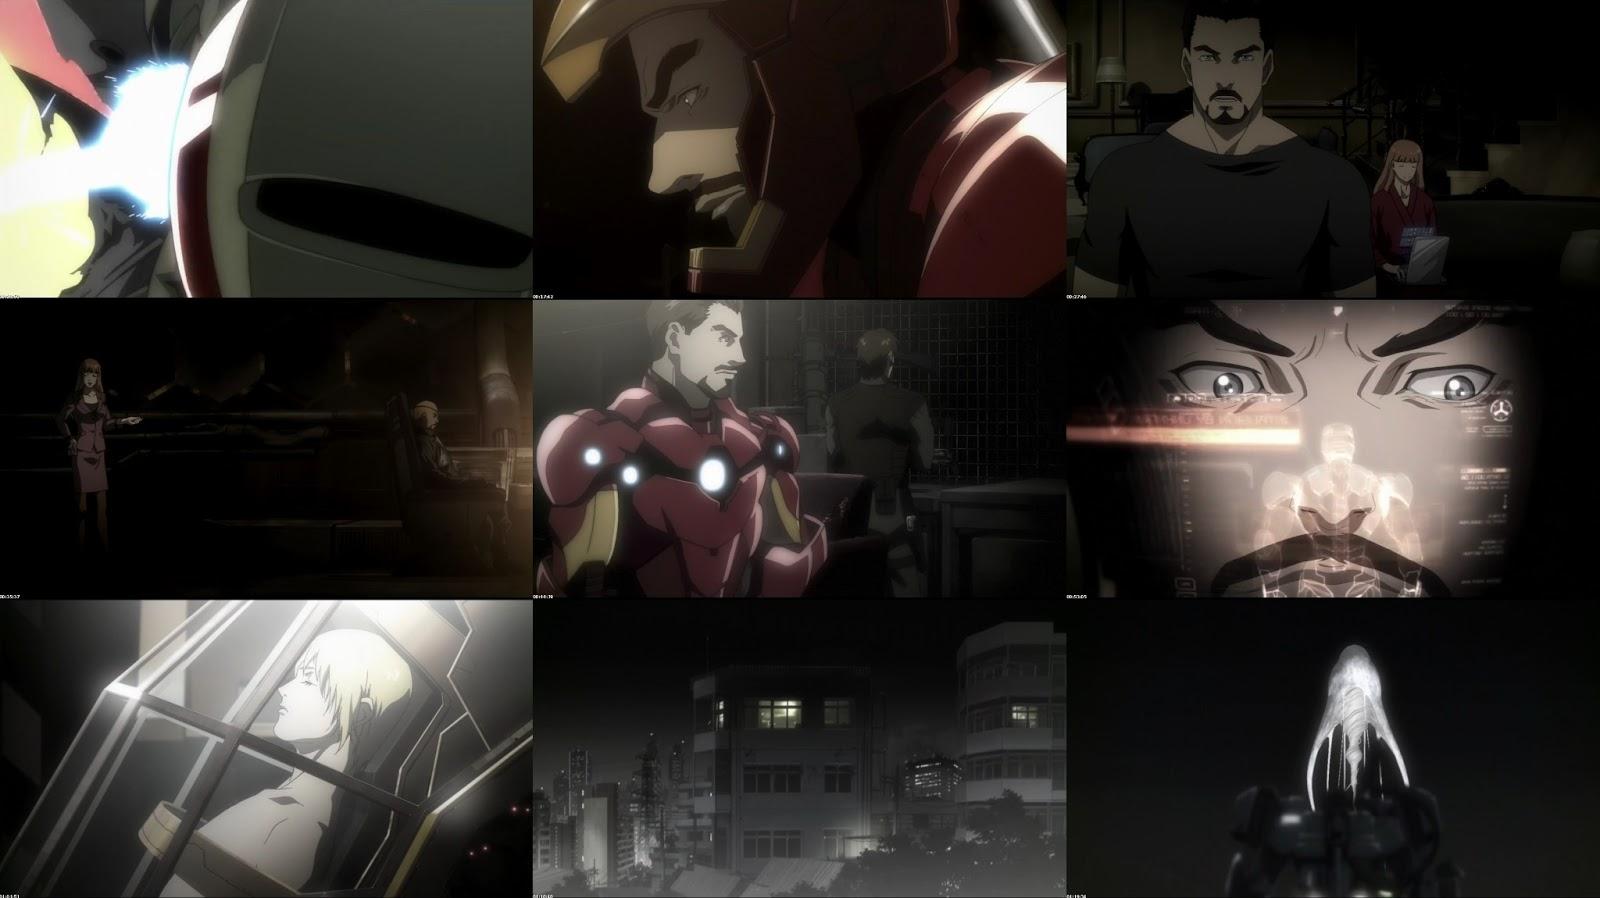 iron man rise of technovore full movie online